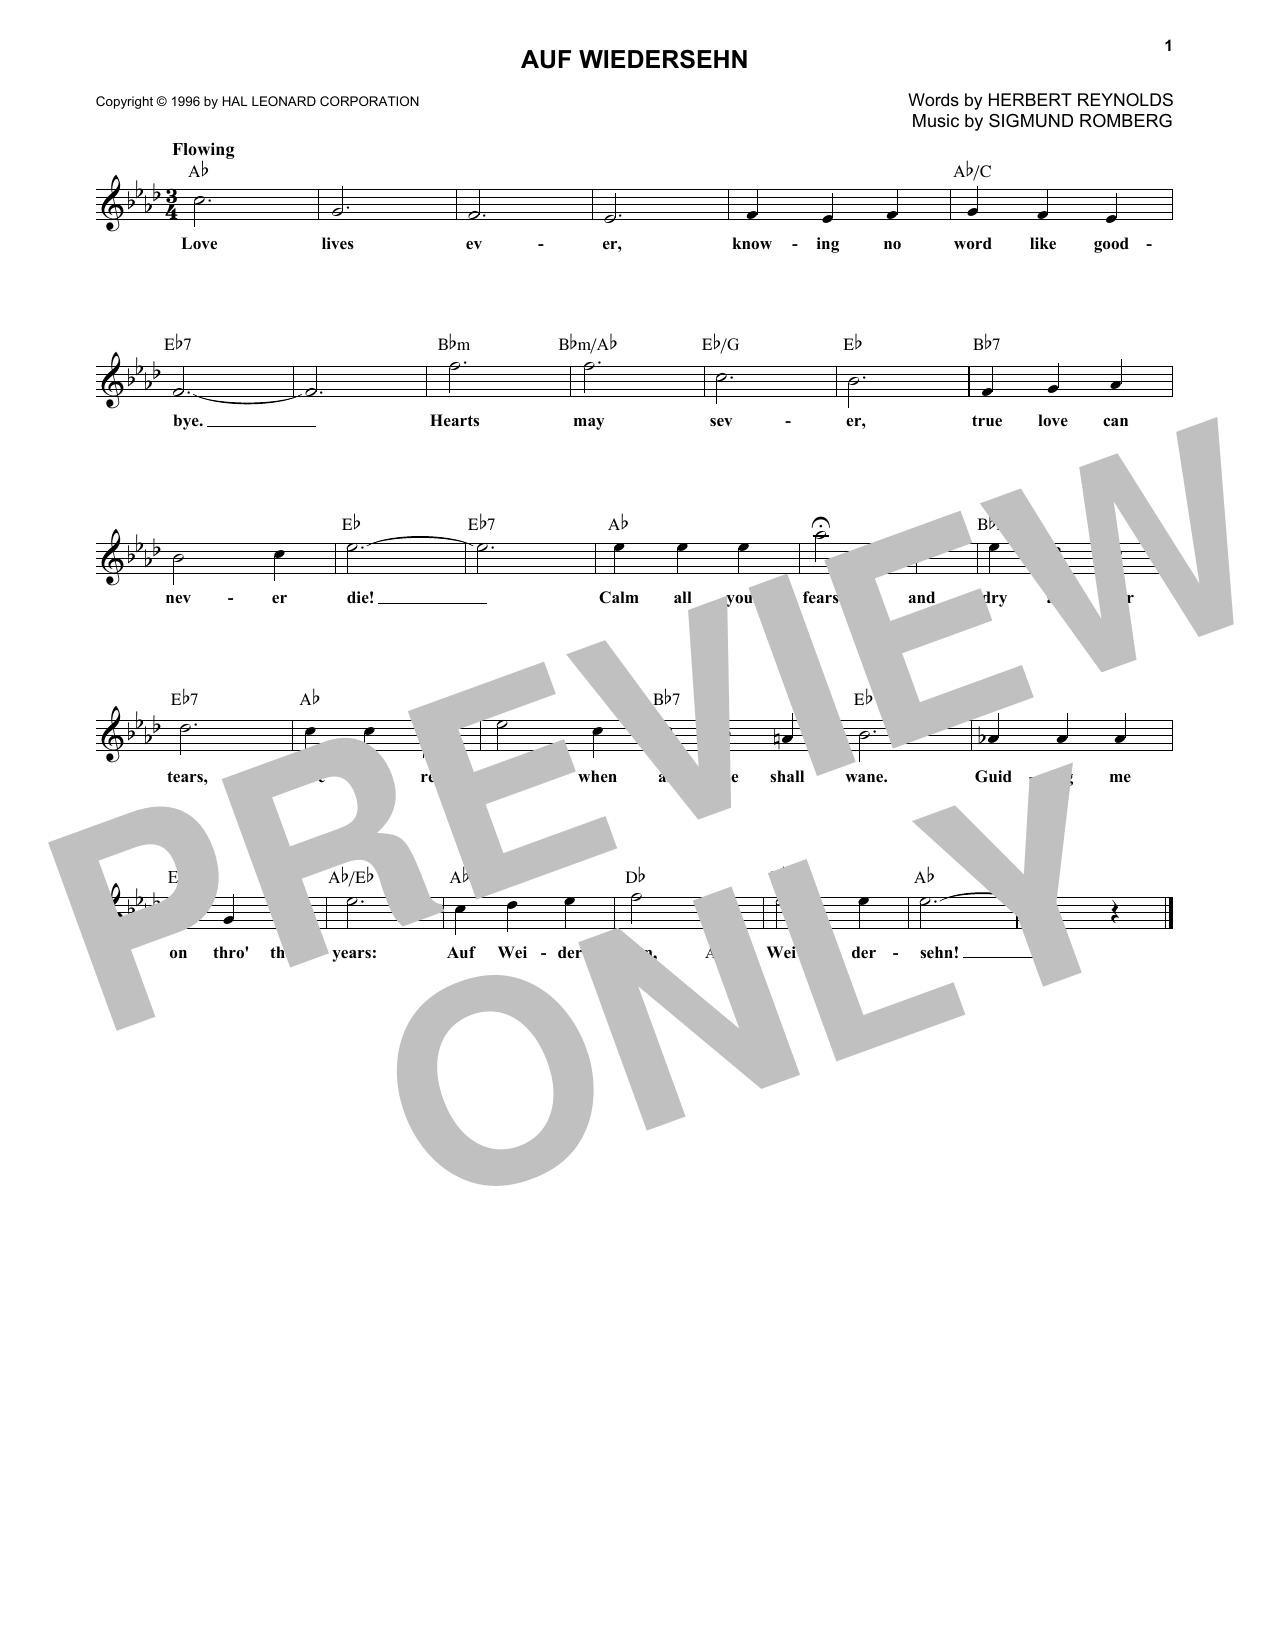 Sigmund Romberg Auf Wiedersehn sheet music notes and chords. Download Printable PDF.